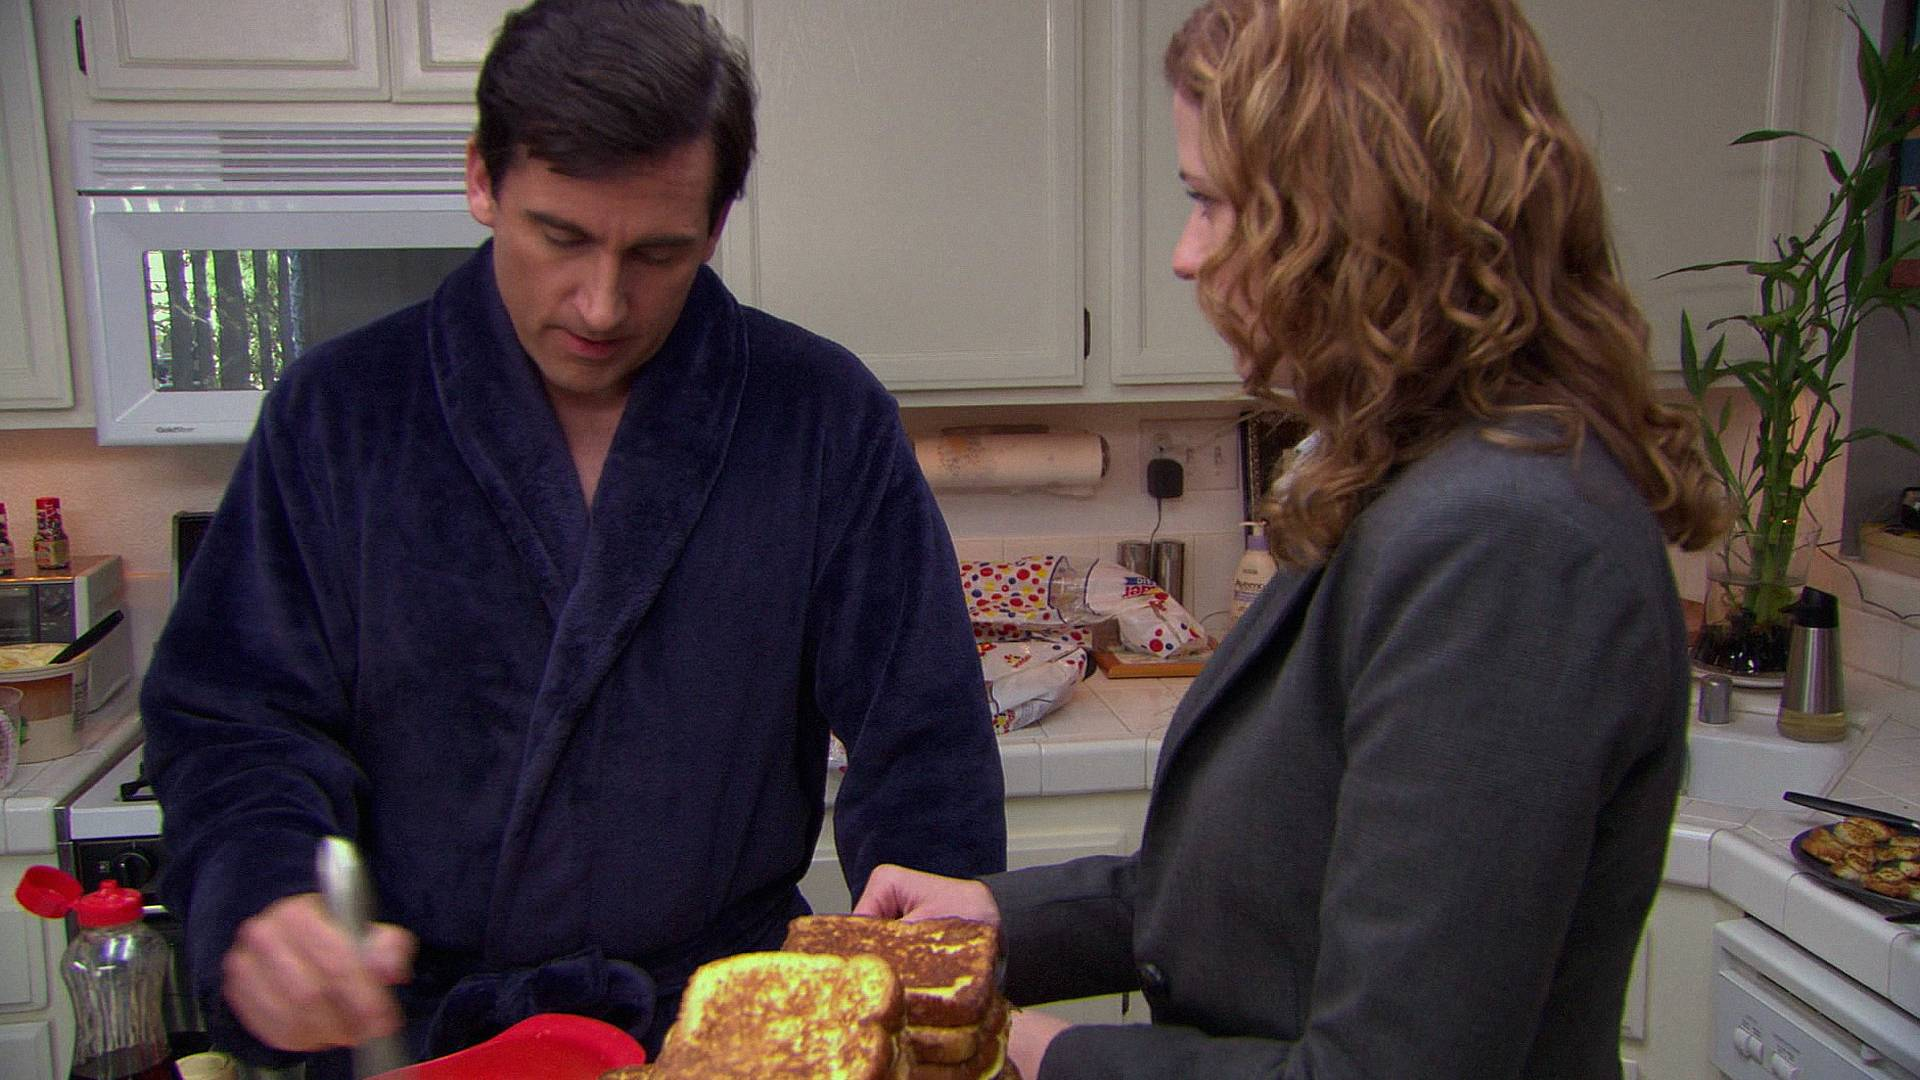 The Office Season 5 Episode 22